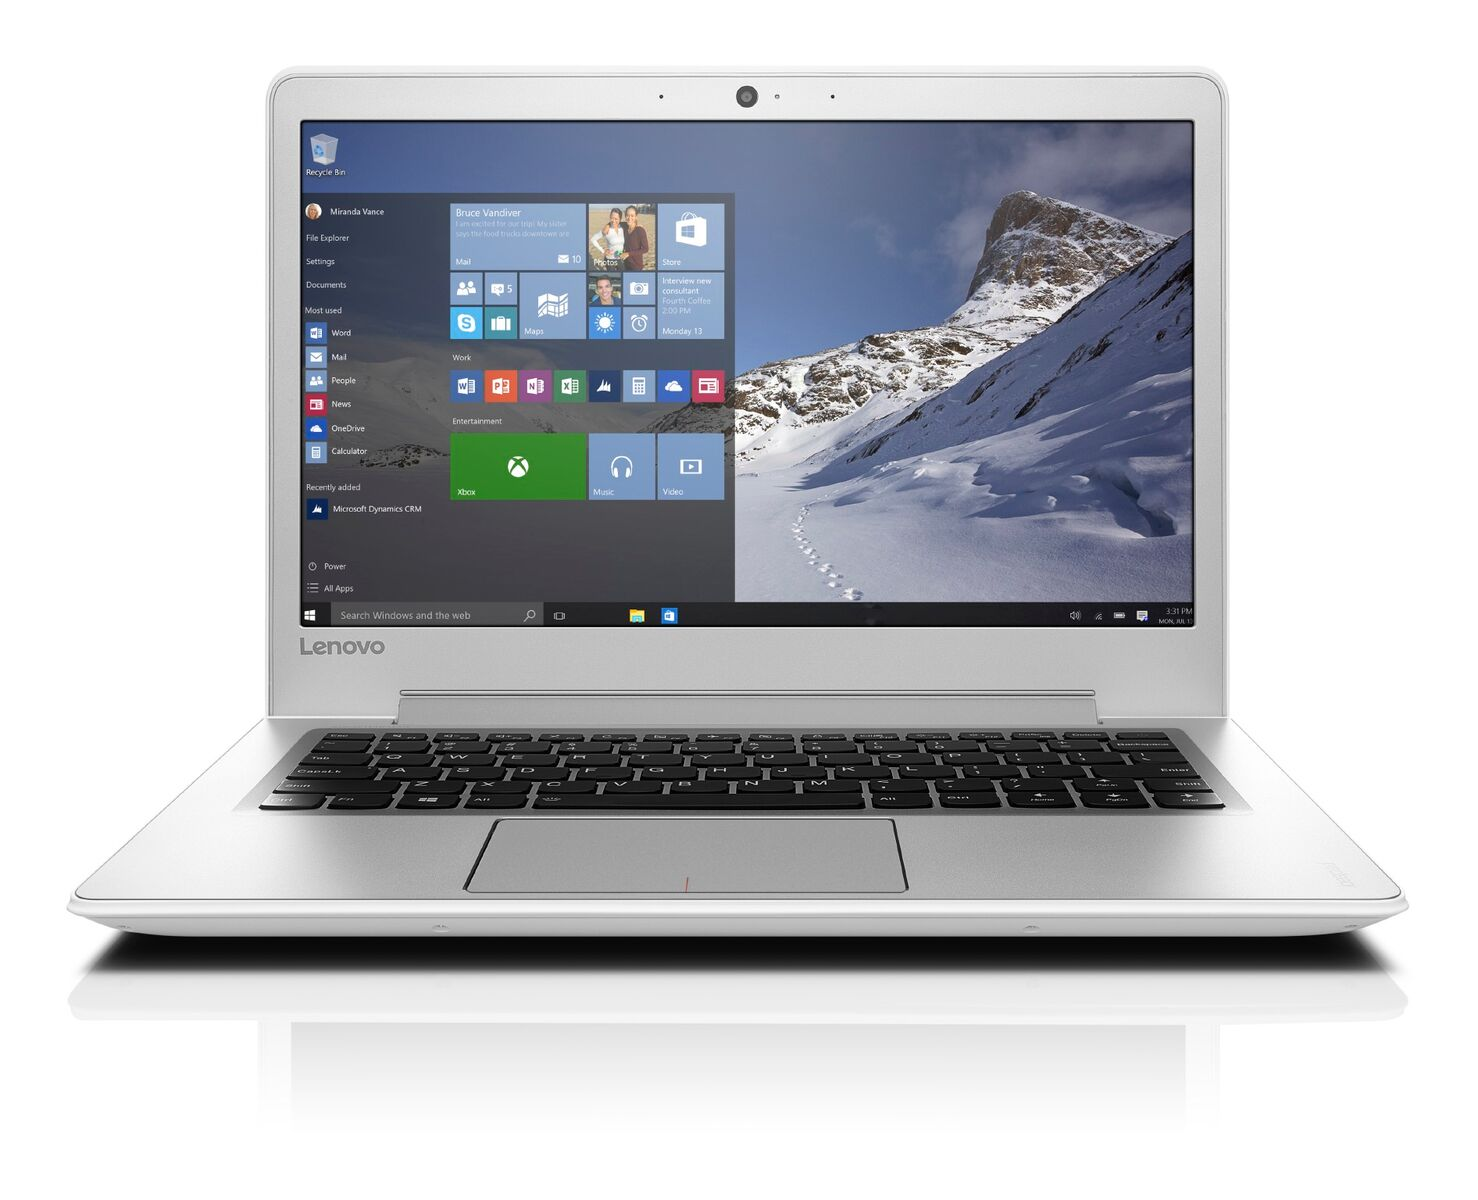 "Lenovo IdeaPad 510S-13IKB i5-7200U 3,10GHz/8GB/SSD 256GB/13,3"" FHD/IPS/AG/WIN10 bílá 80V0000WCK"